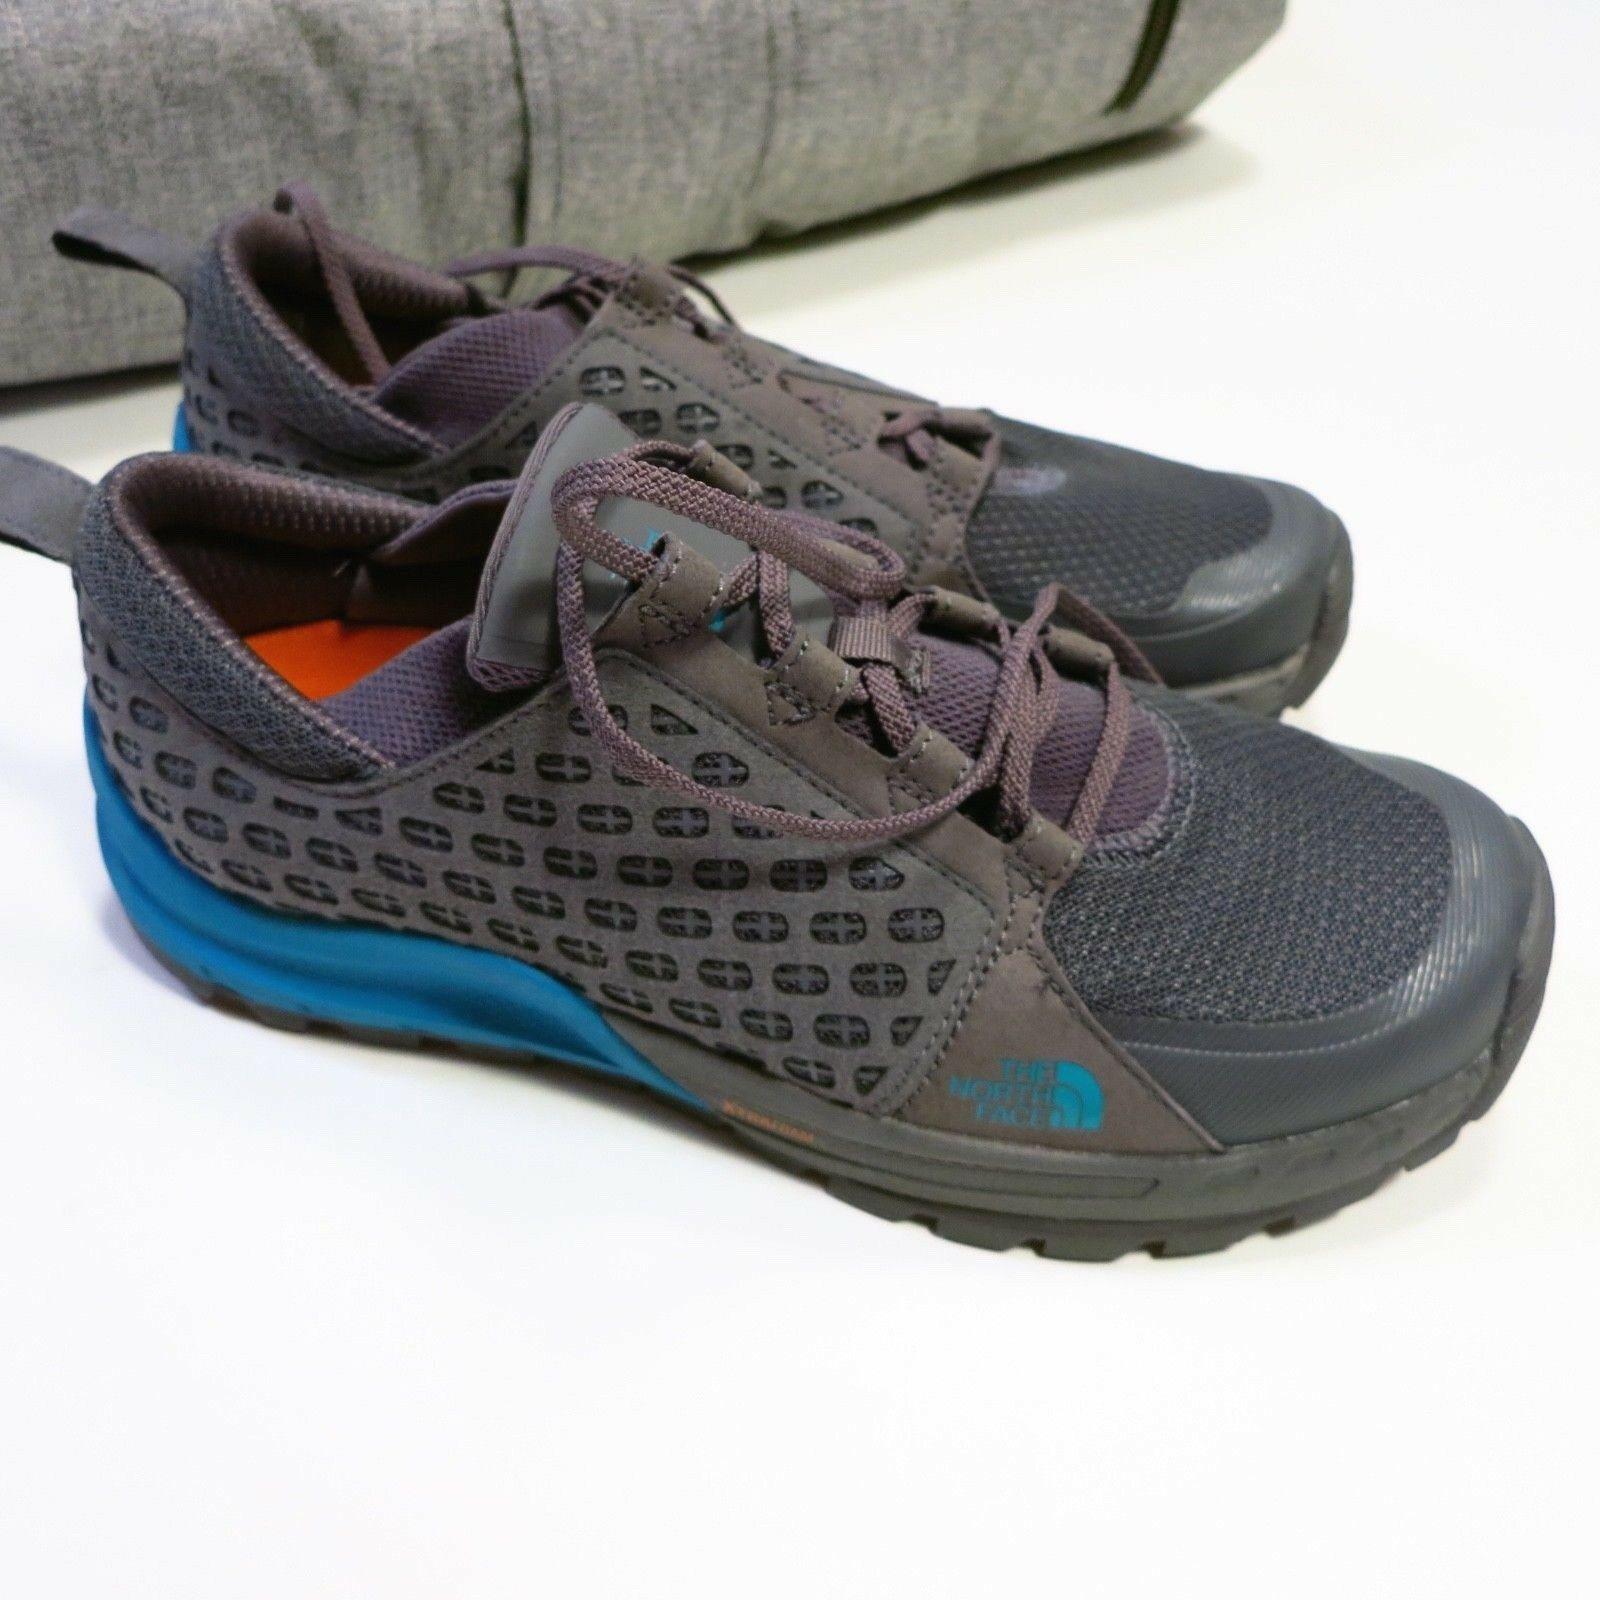 100 North Face Men's Mountain Sneaker Size 9 Grey blueeeeeeeee NEW Style NF0A32ZU  100% free shipping